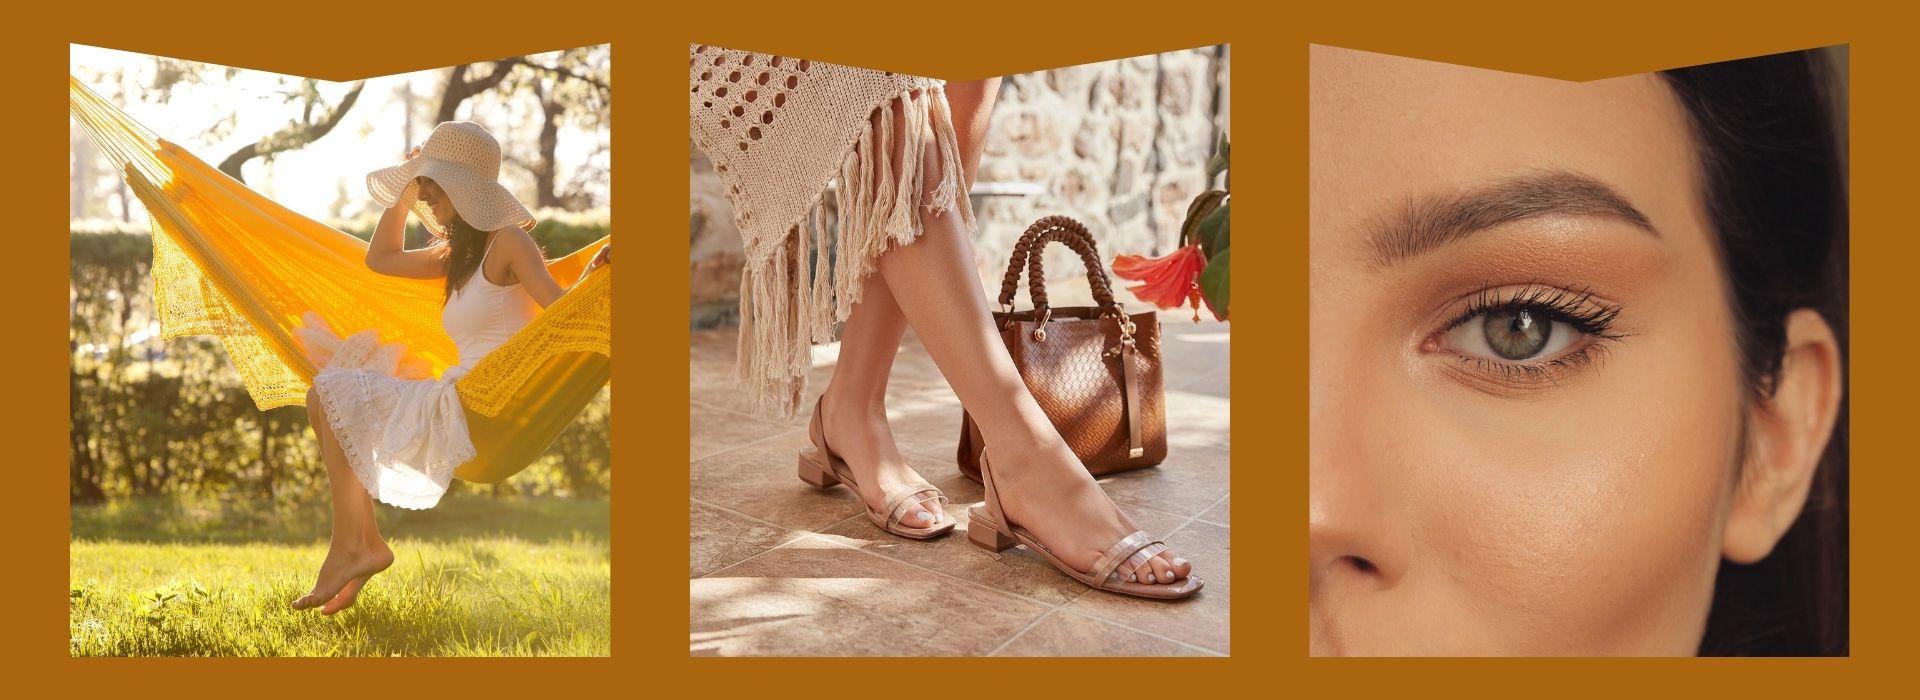 Flowy dress, sandals, mascara